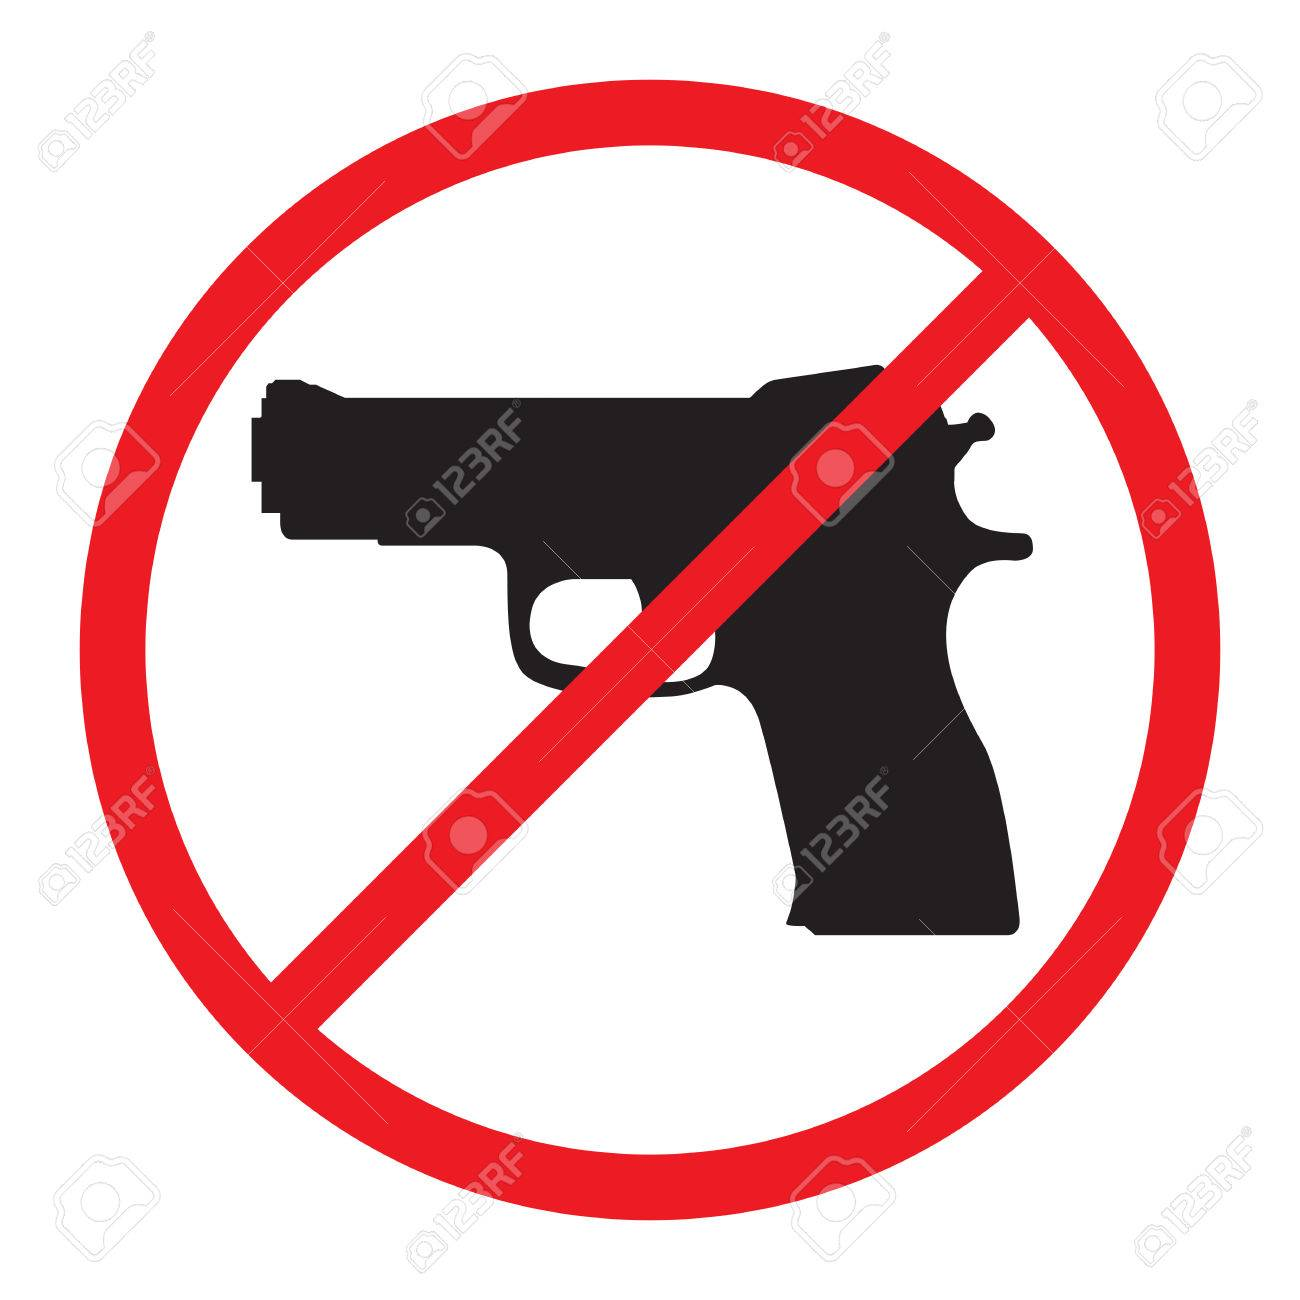 51059226-no-guns-allowed-sign-no-weapons-sign-205831-PuUmt75q